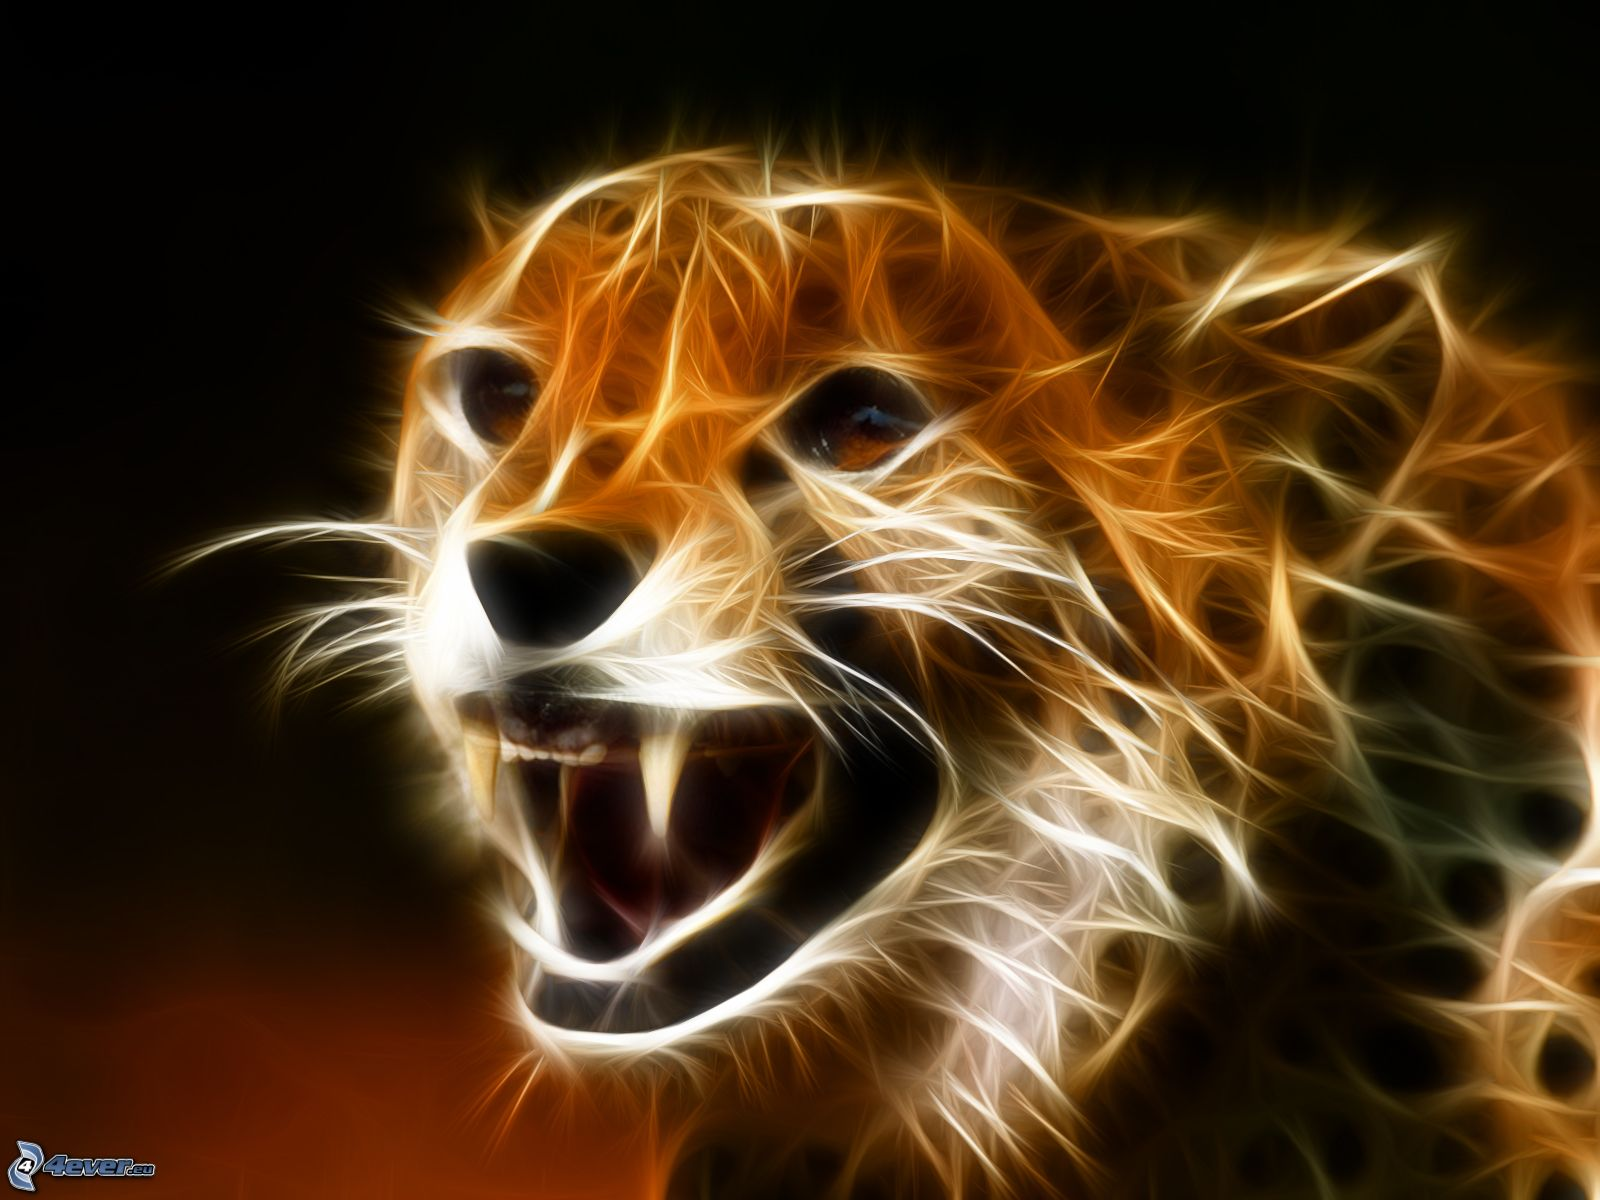 25 fractales de animales hd alguno va a gustarte taringa